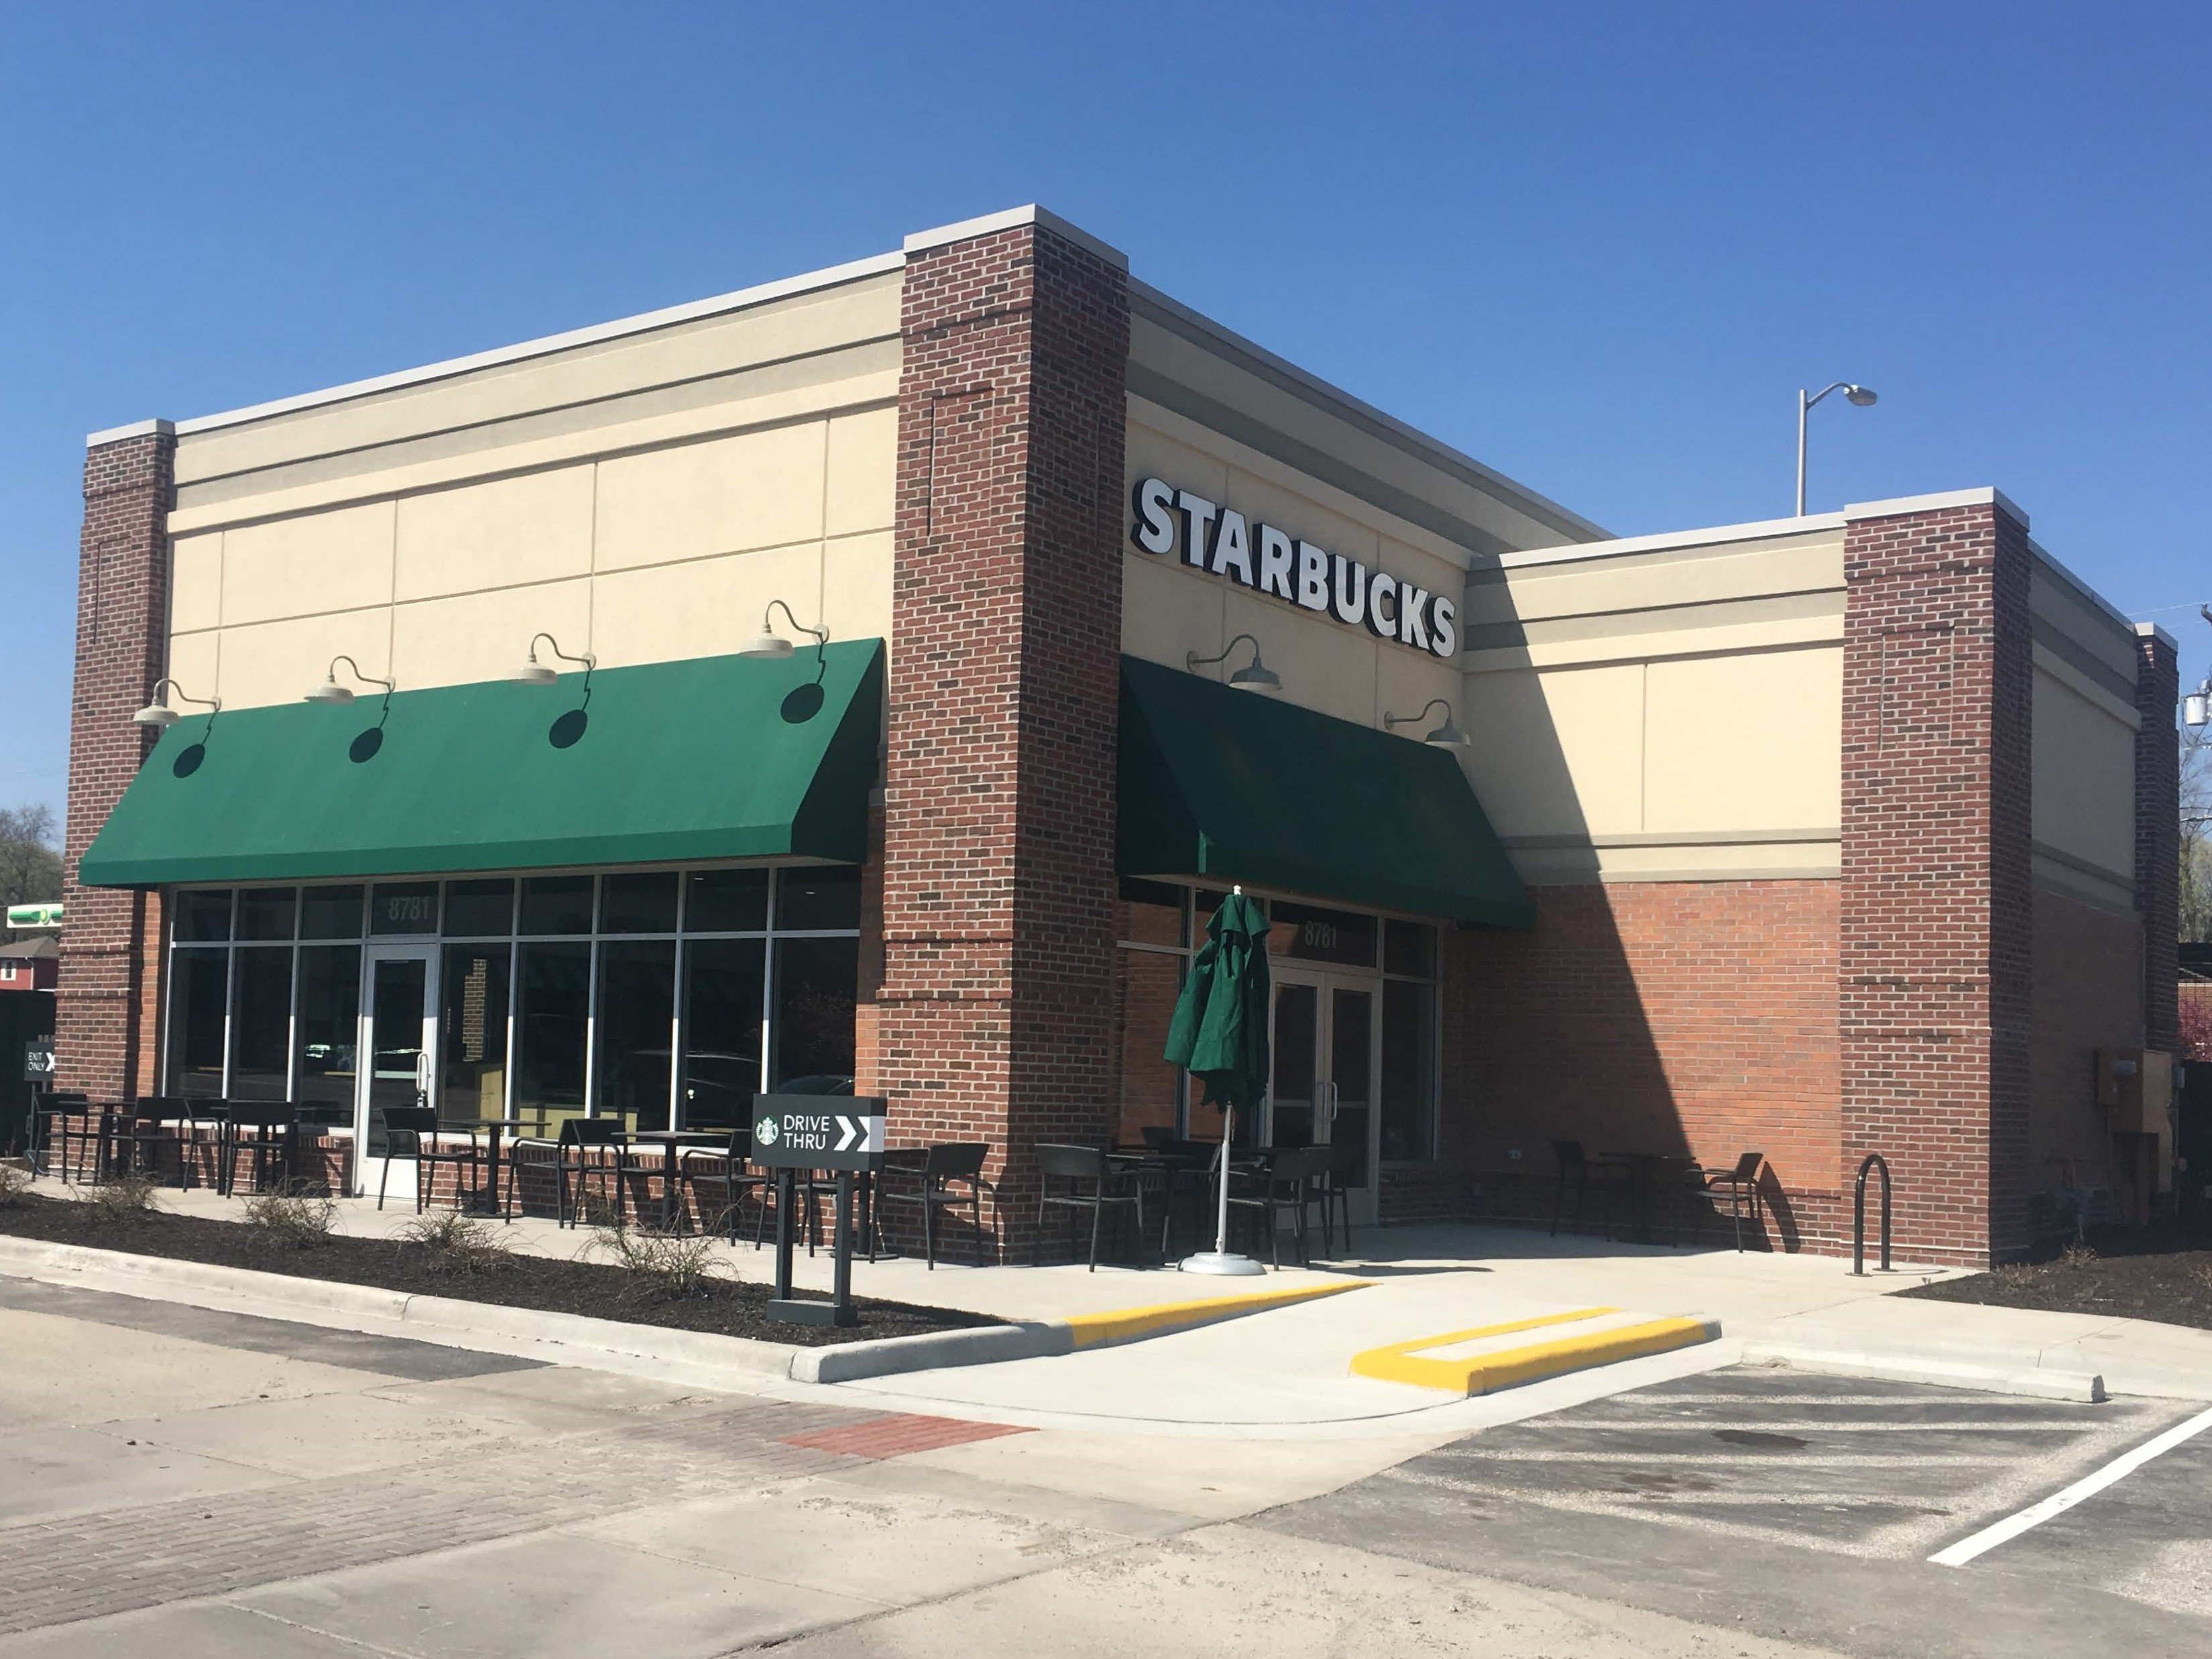 Cherokee South Starbucks